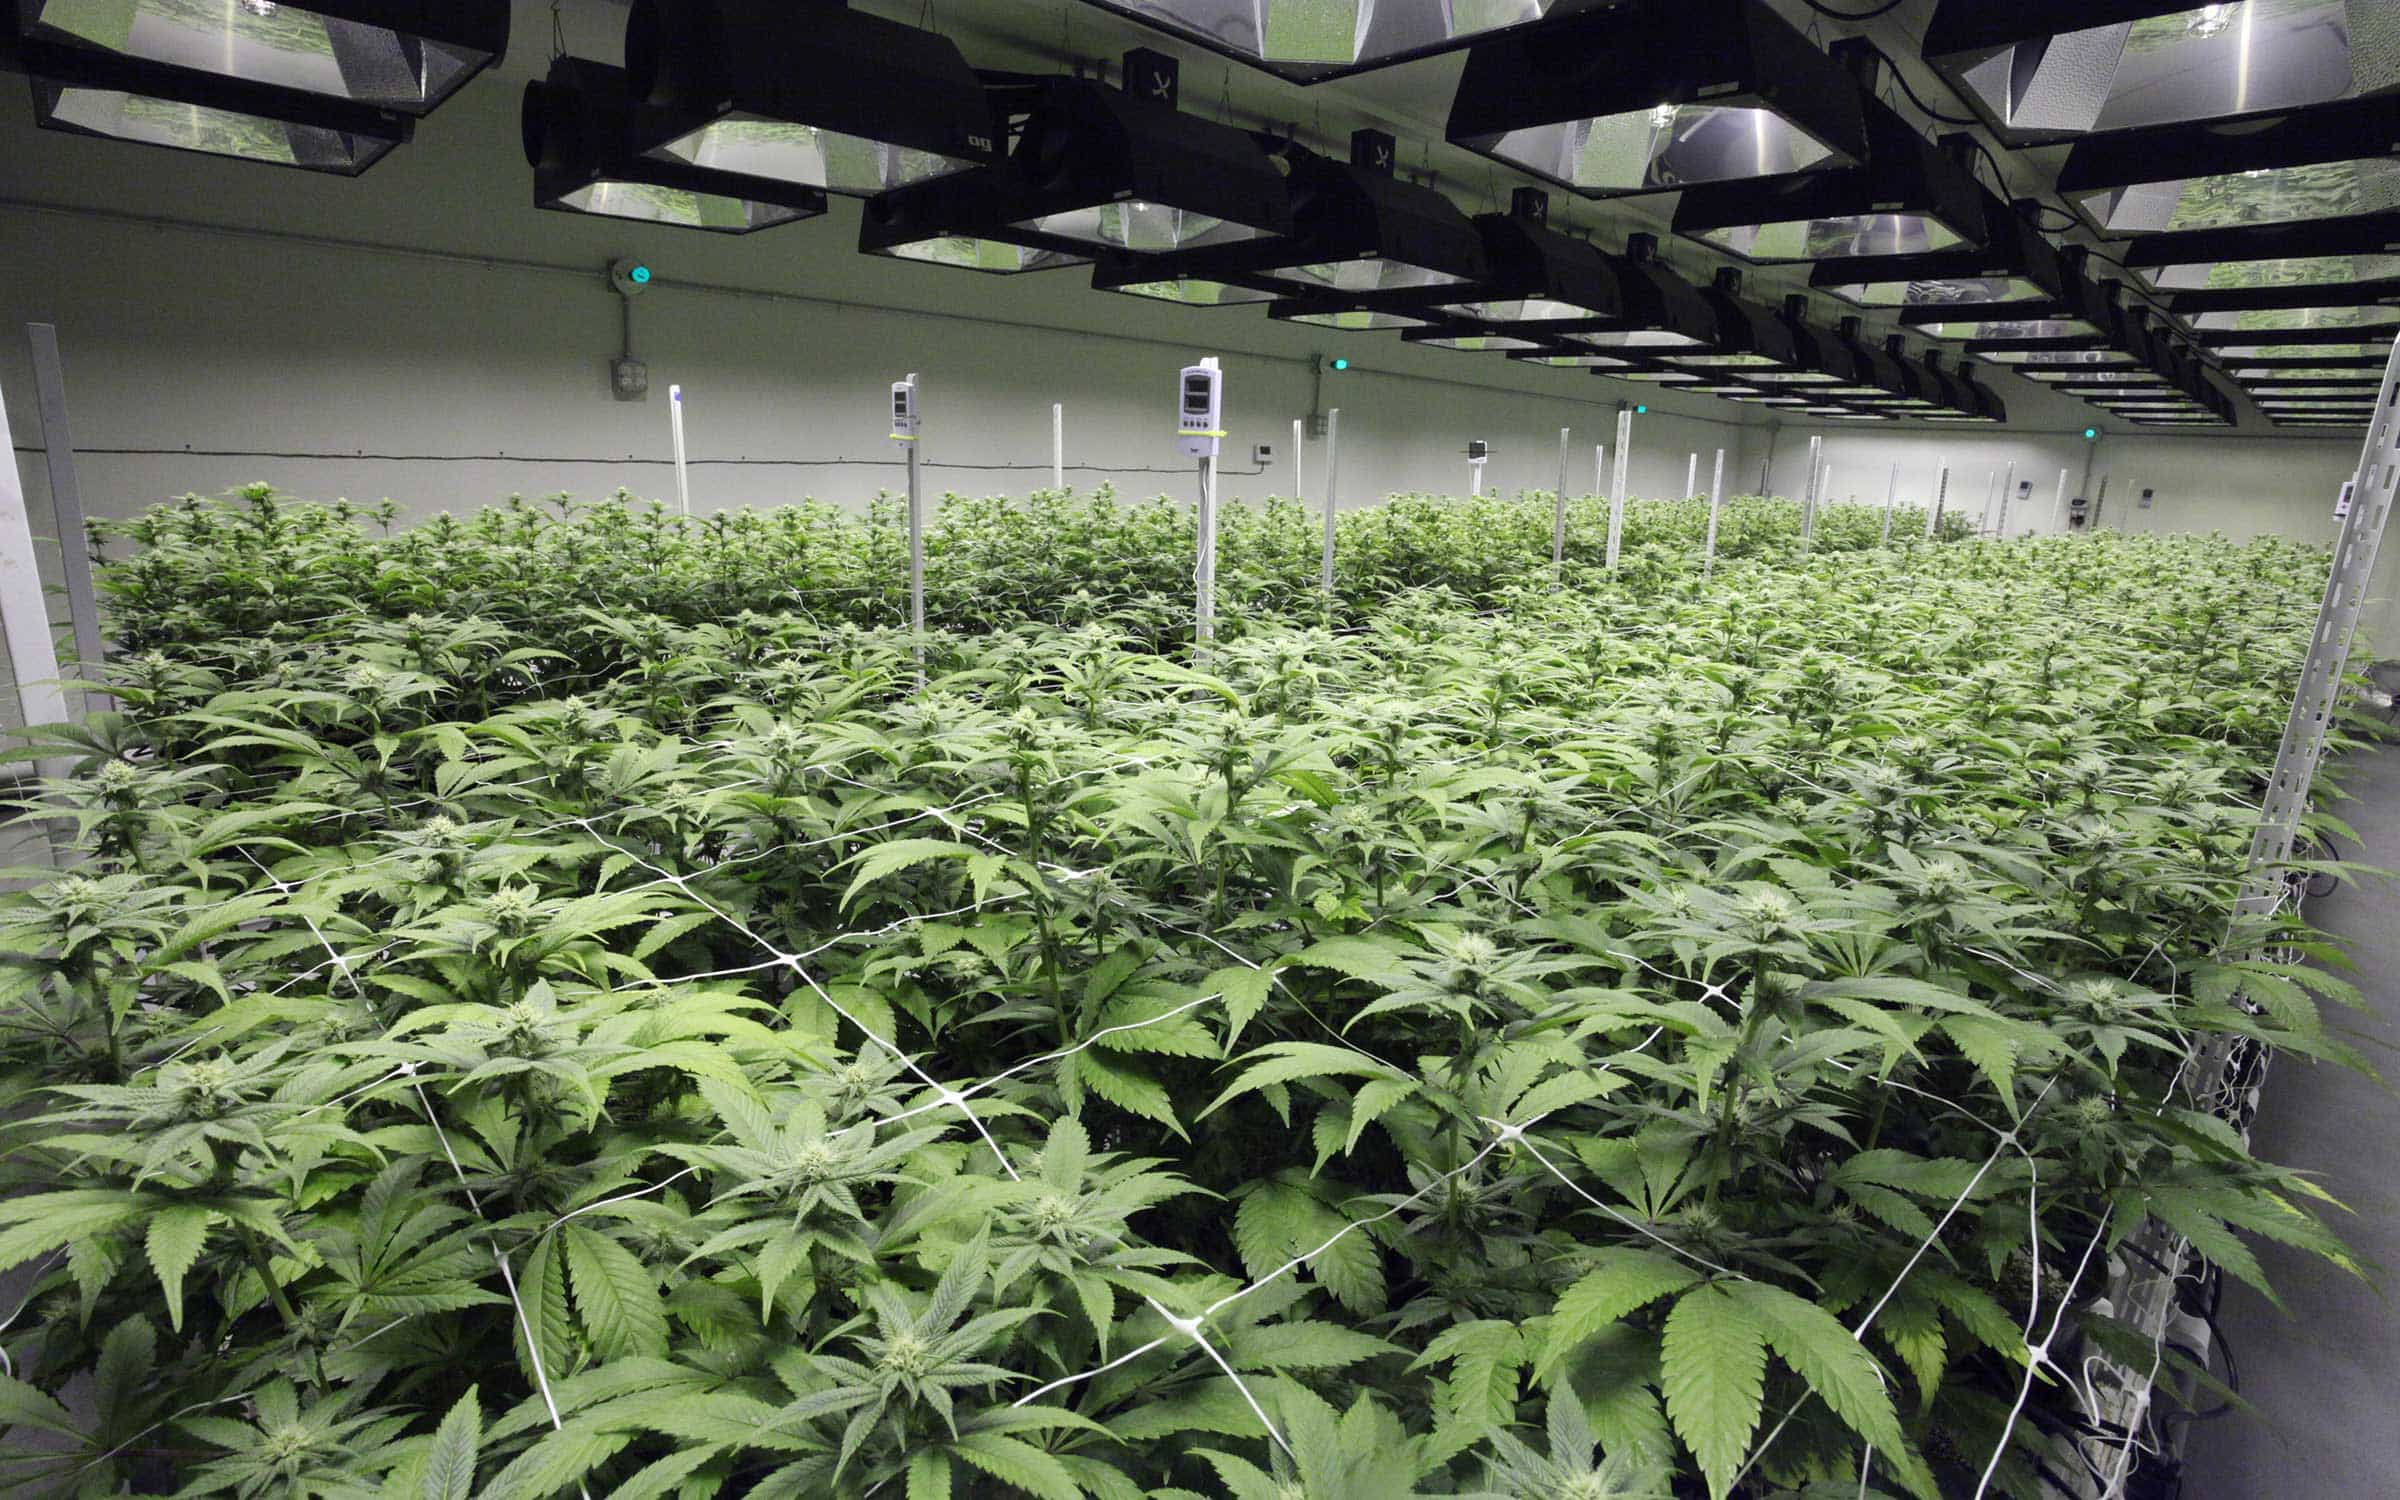 Maine Recreational Cannabis - Craft Maine Marijuana & Cannabis Strains at Zero Gravity Cannabis